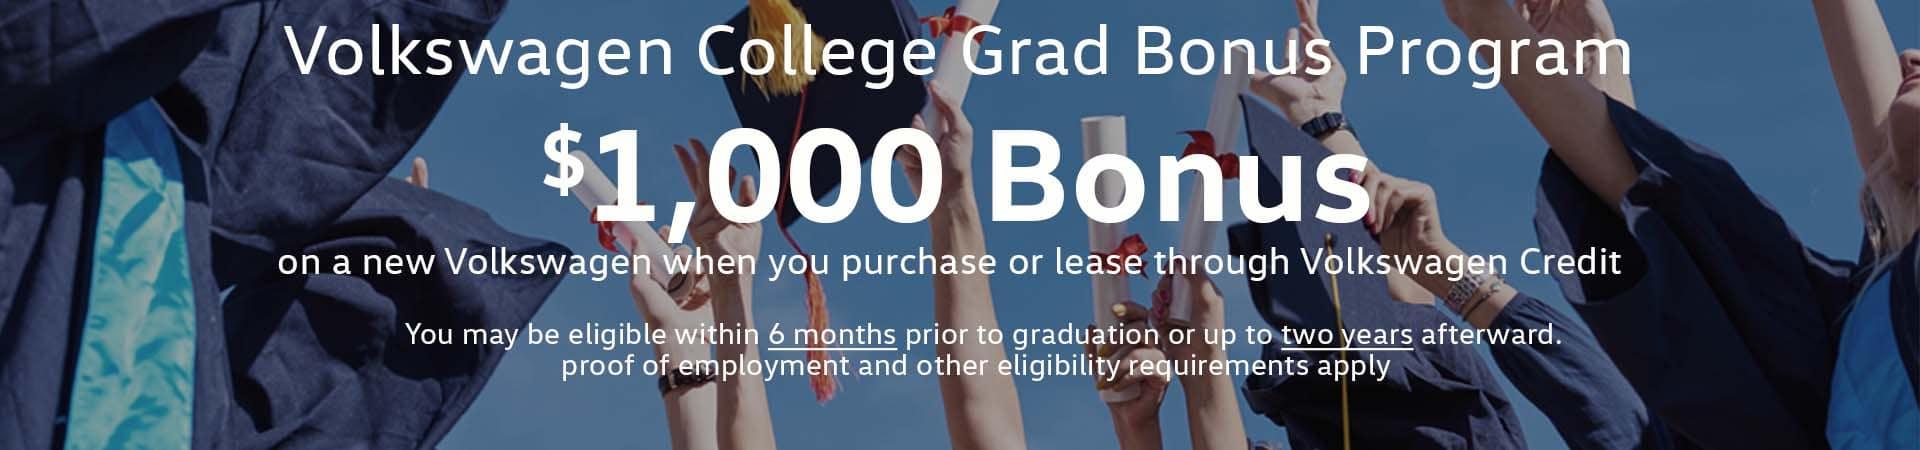 College Grad Bonus Slide